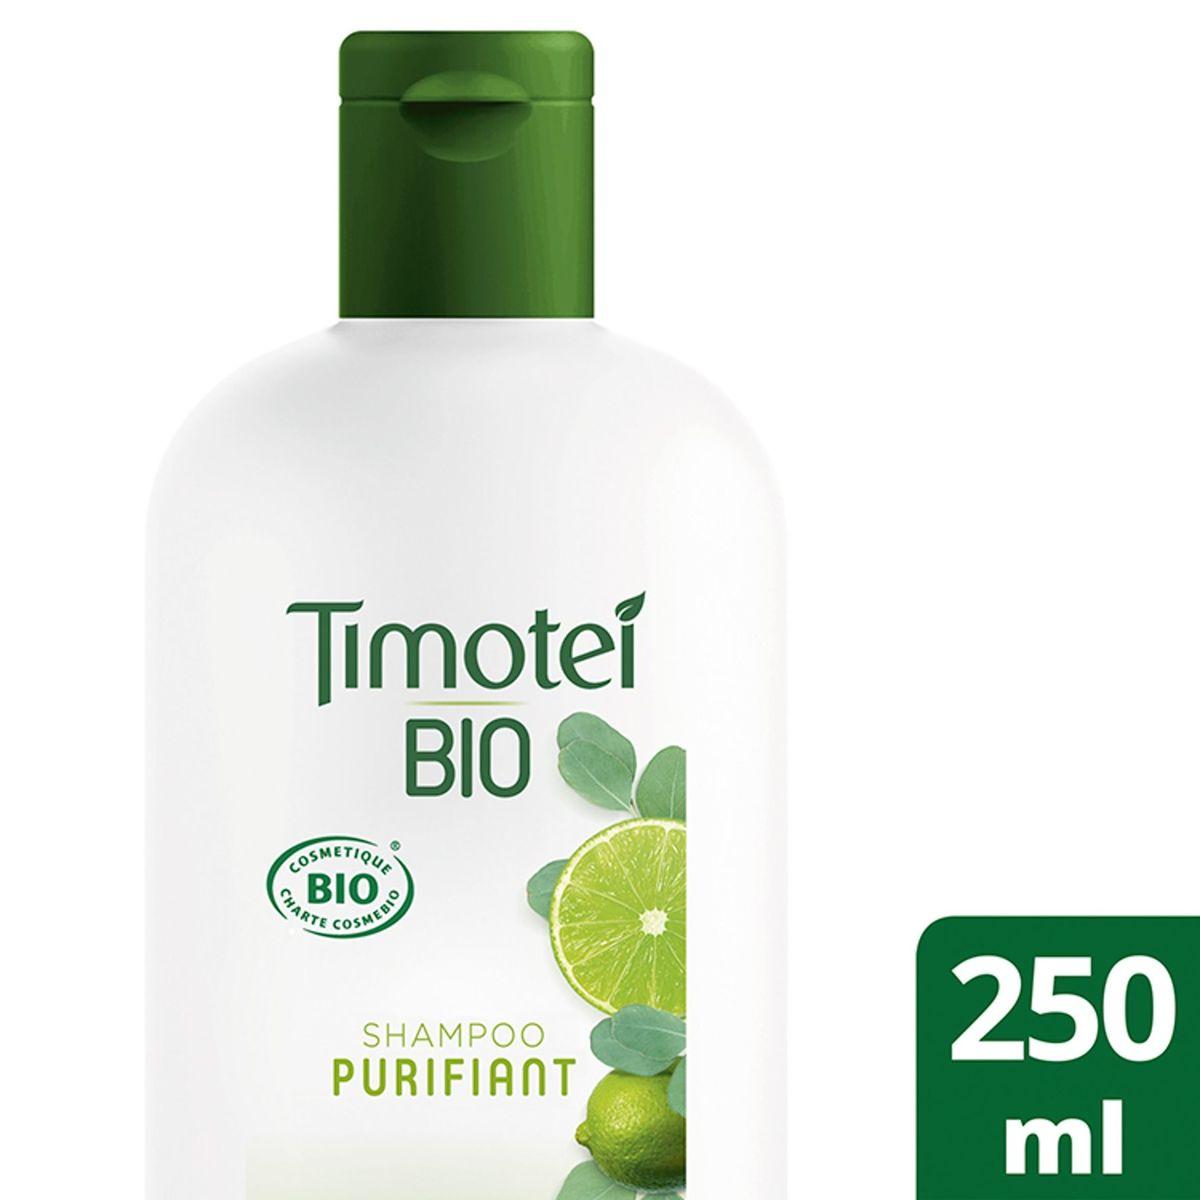 Timotei Shampooing BIO Purifiant 2 en 1 250 ml